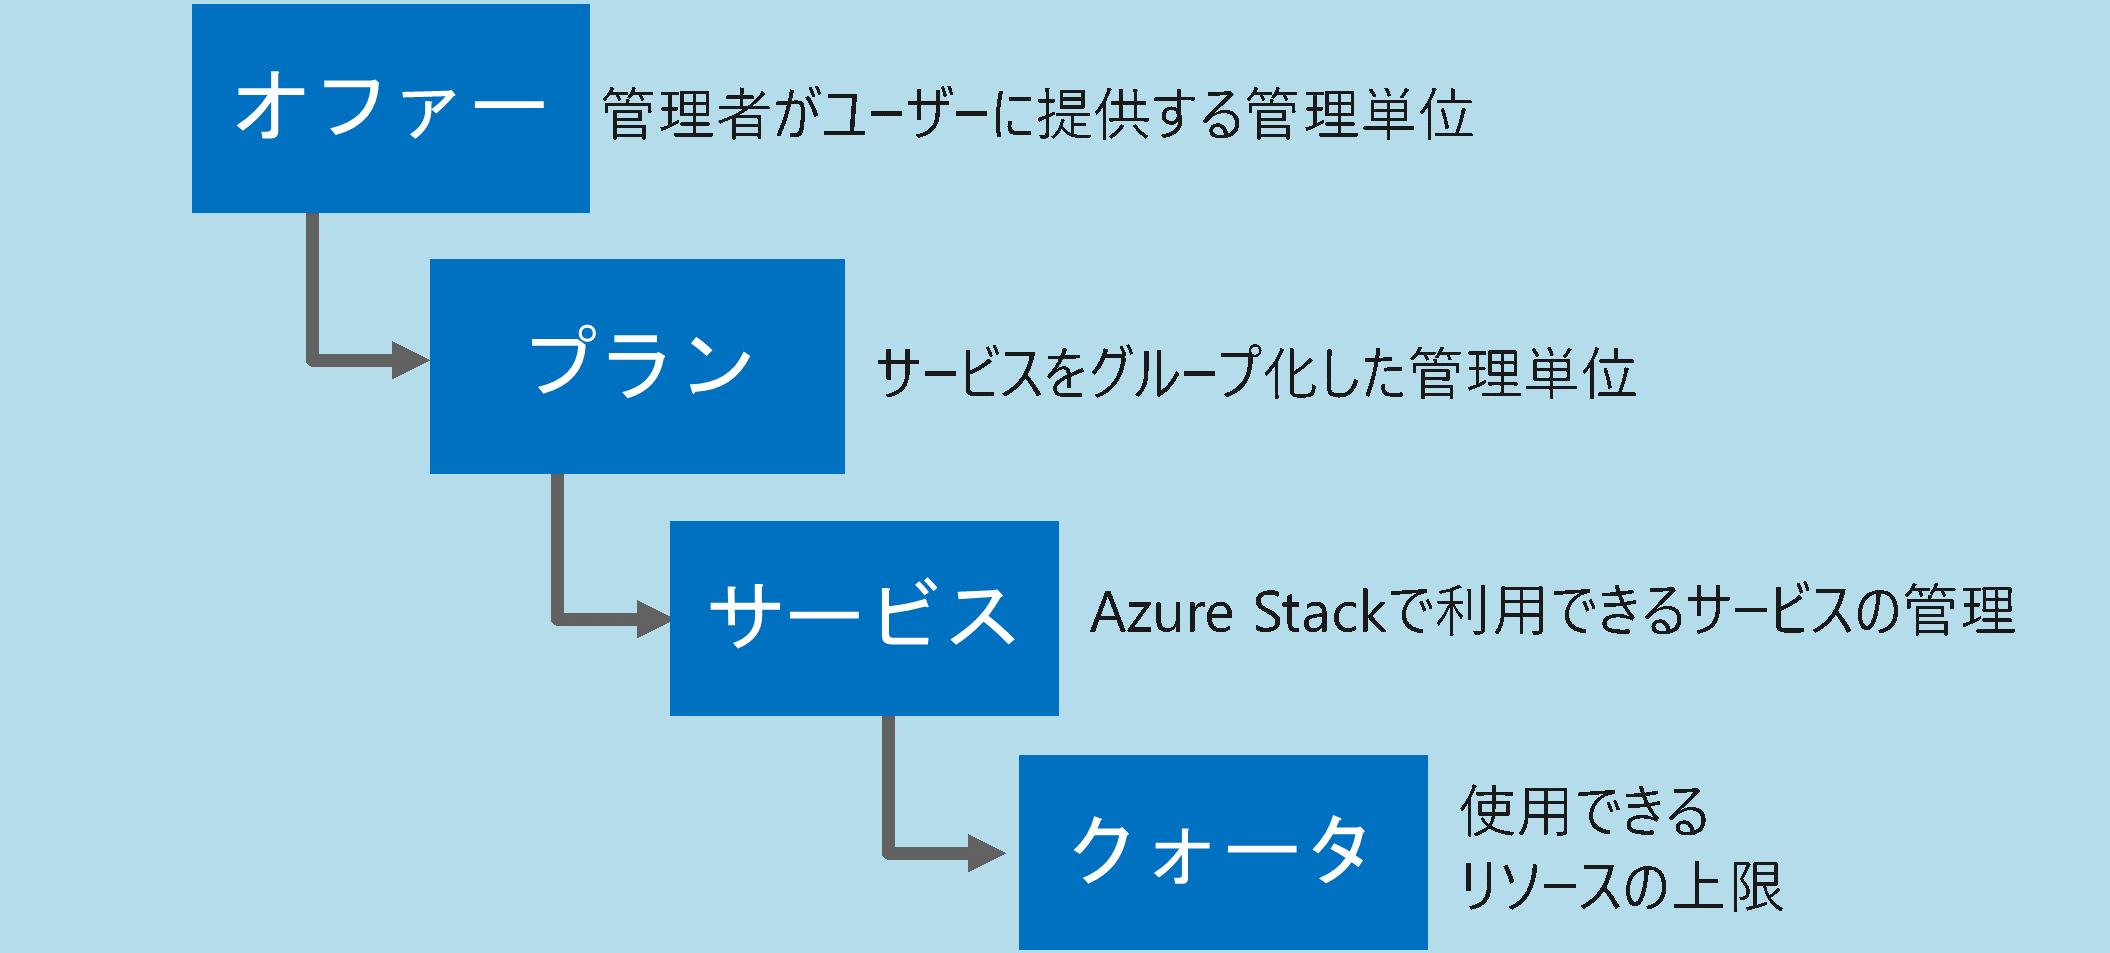 Azure Stack管理単位